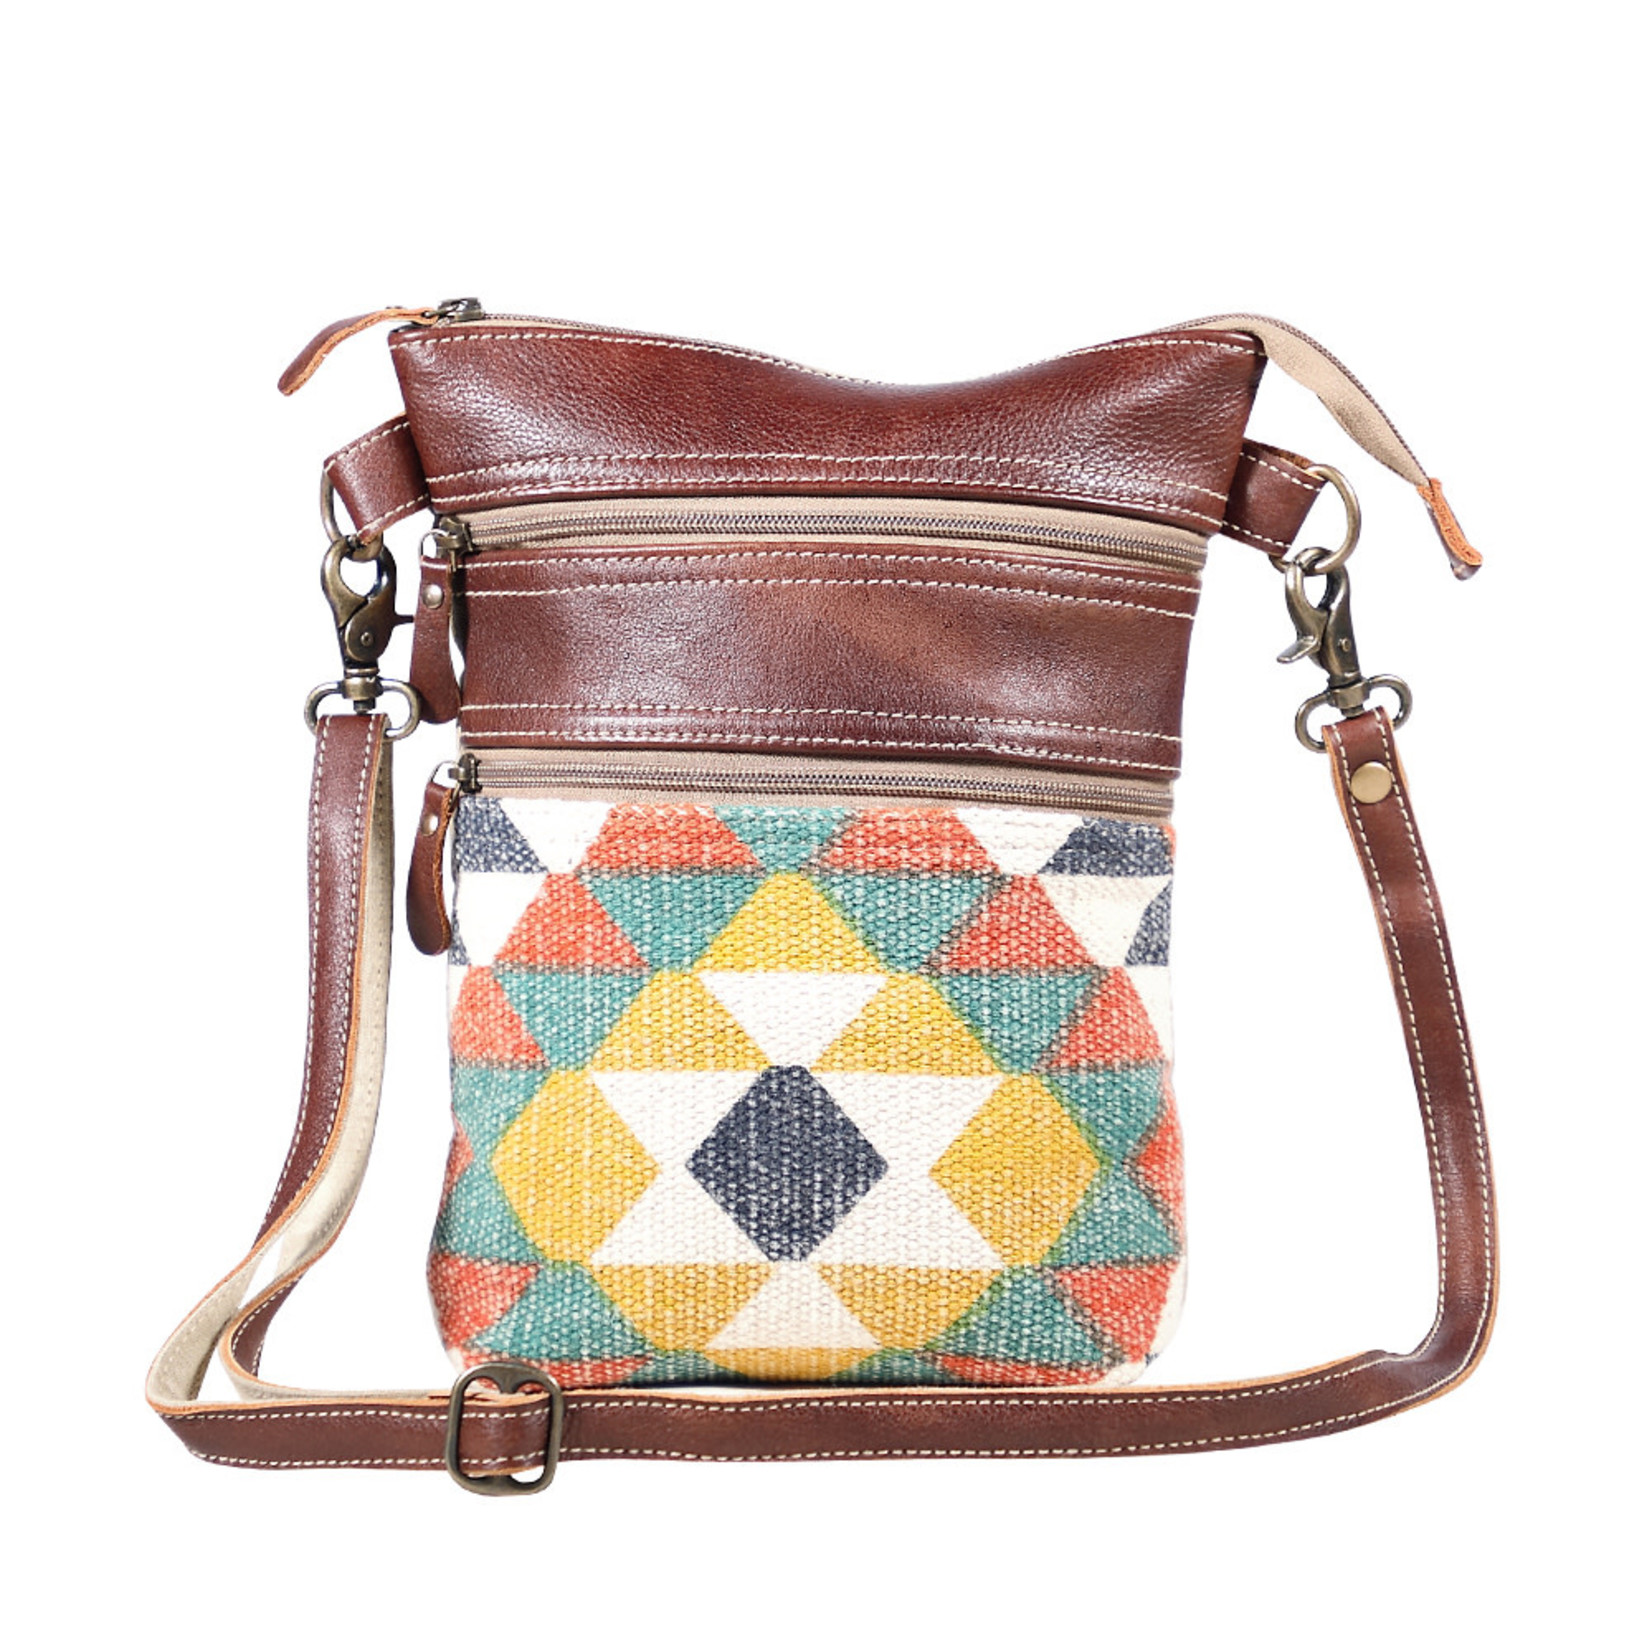 Myra Bags S-1910 Awesome Small & Crossbody Bag